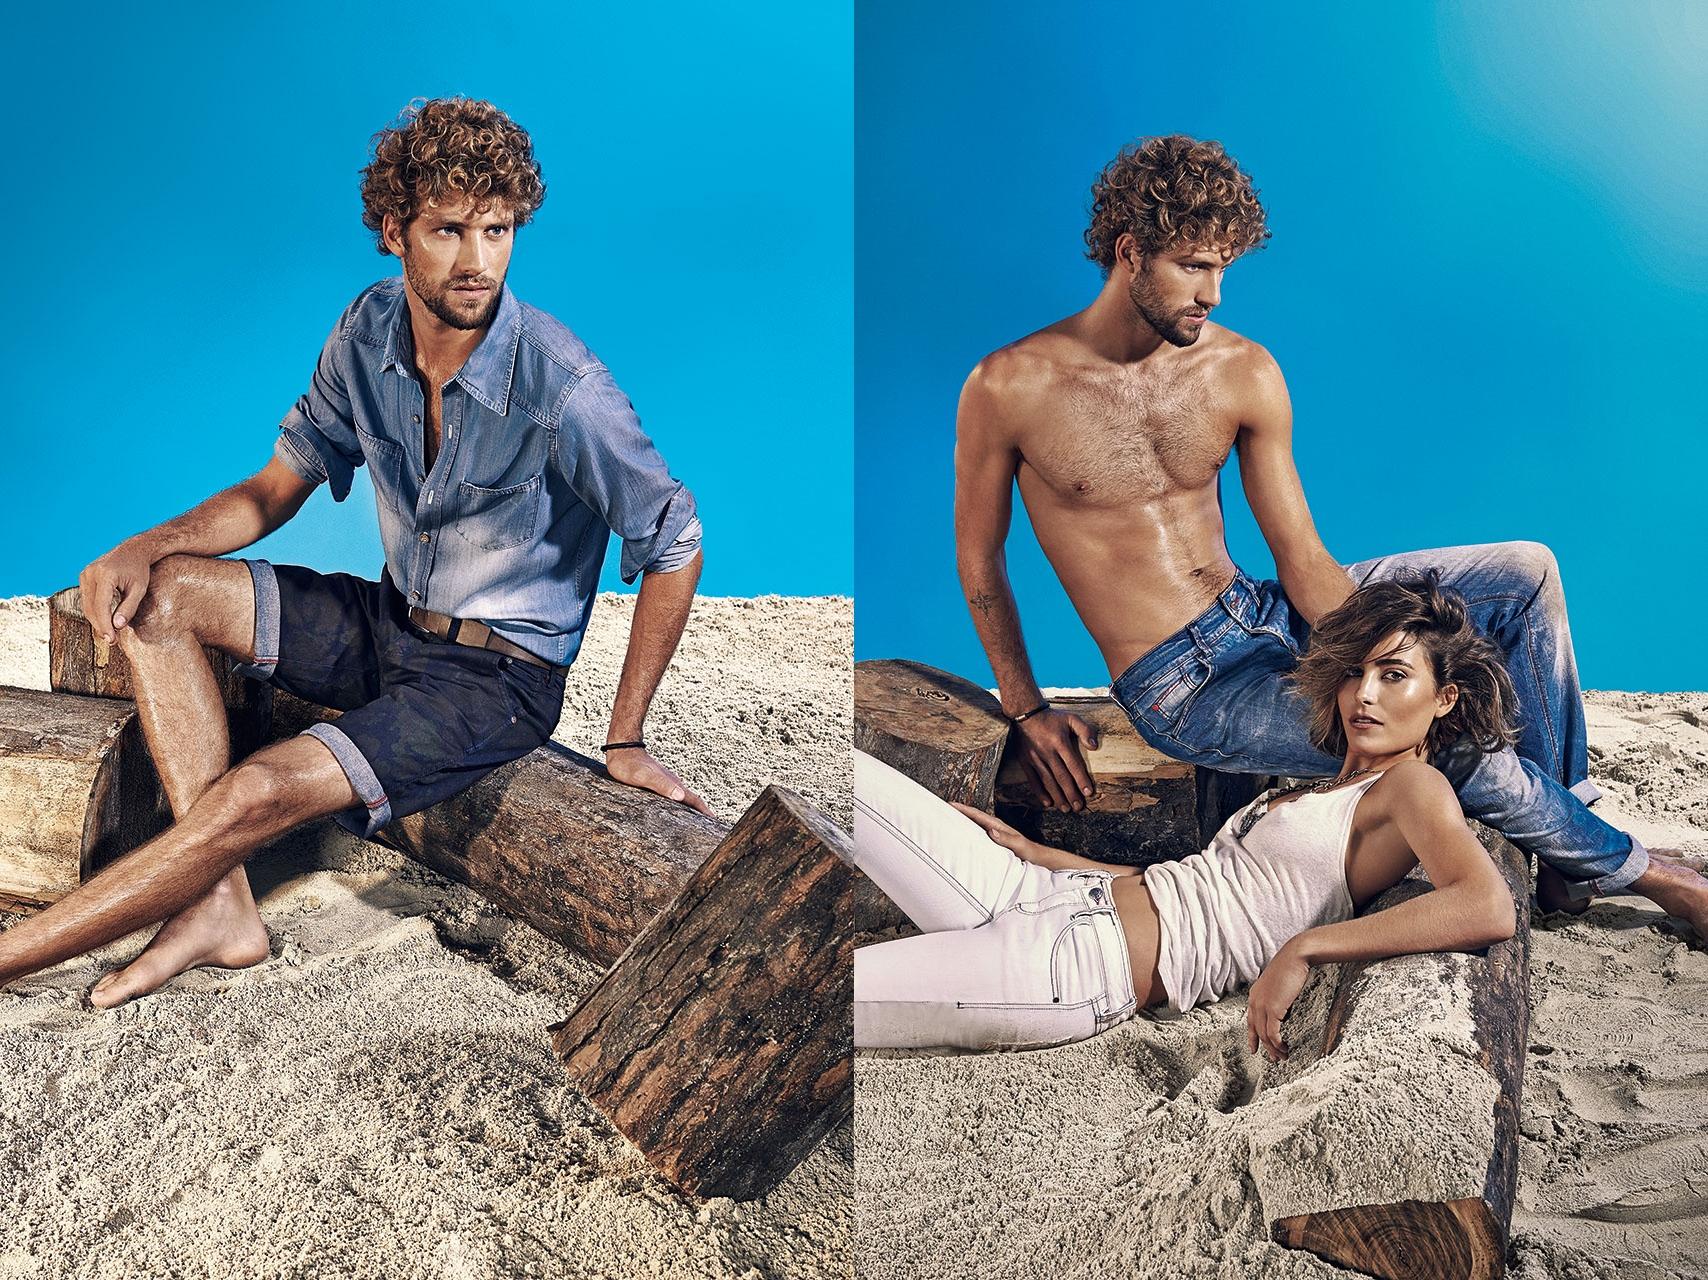 Usina Jeans - Verão 2015, moda masculina, roupas masculina, menswear, fashion blogger, alex cursino, moda sem censura, blog de moda masculina, blogger, 2-tile